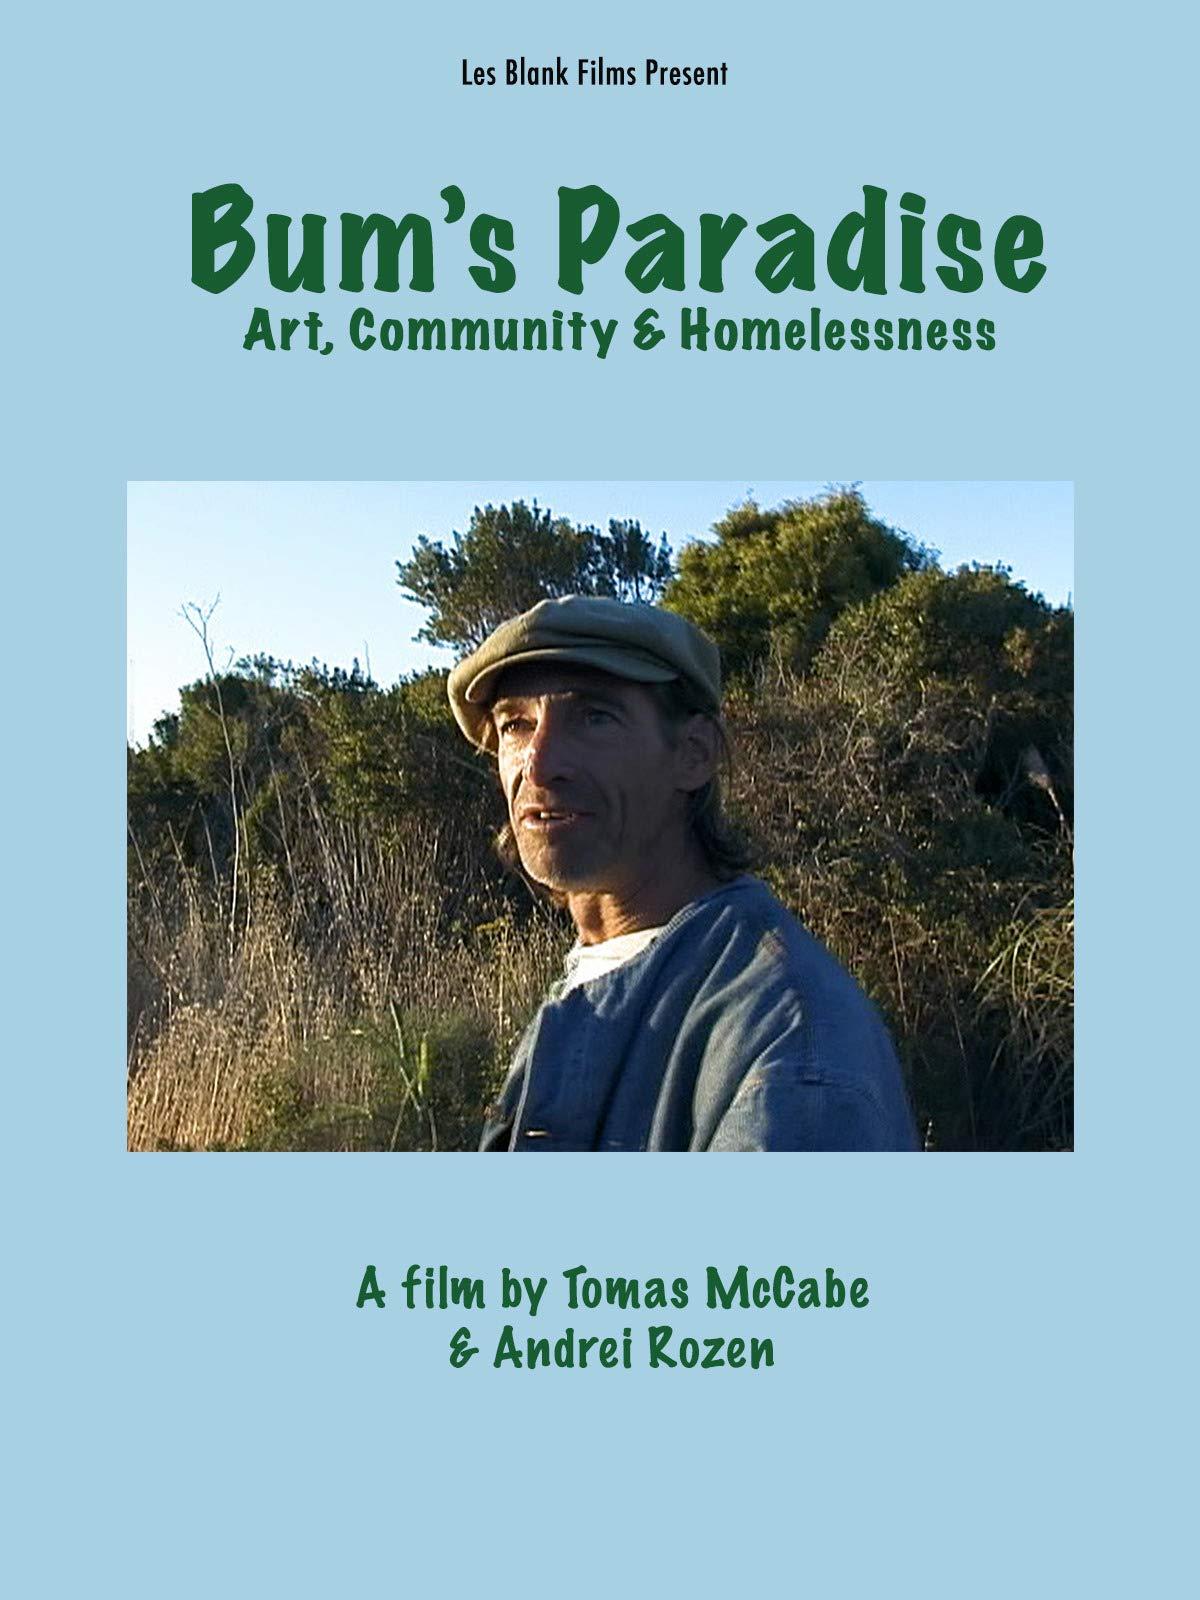 Bum's Paradise